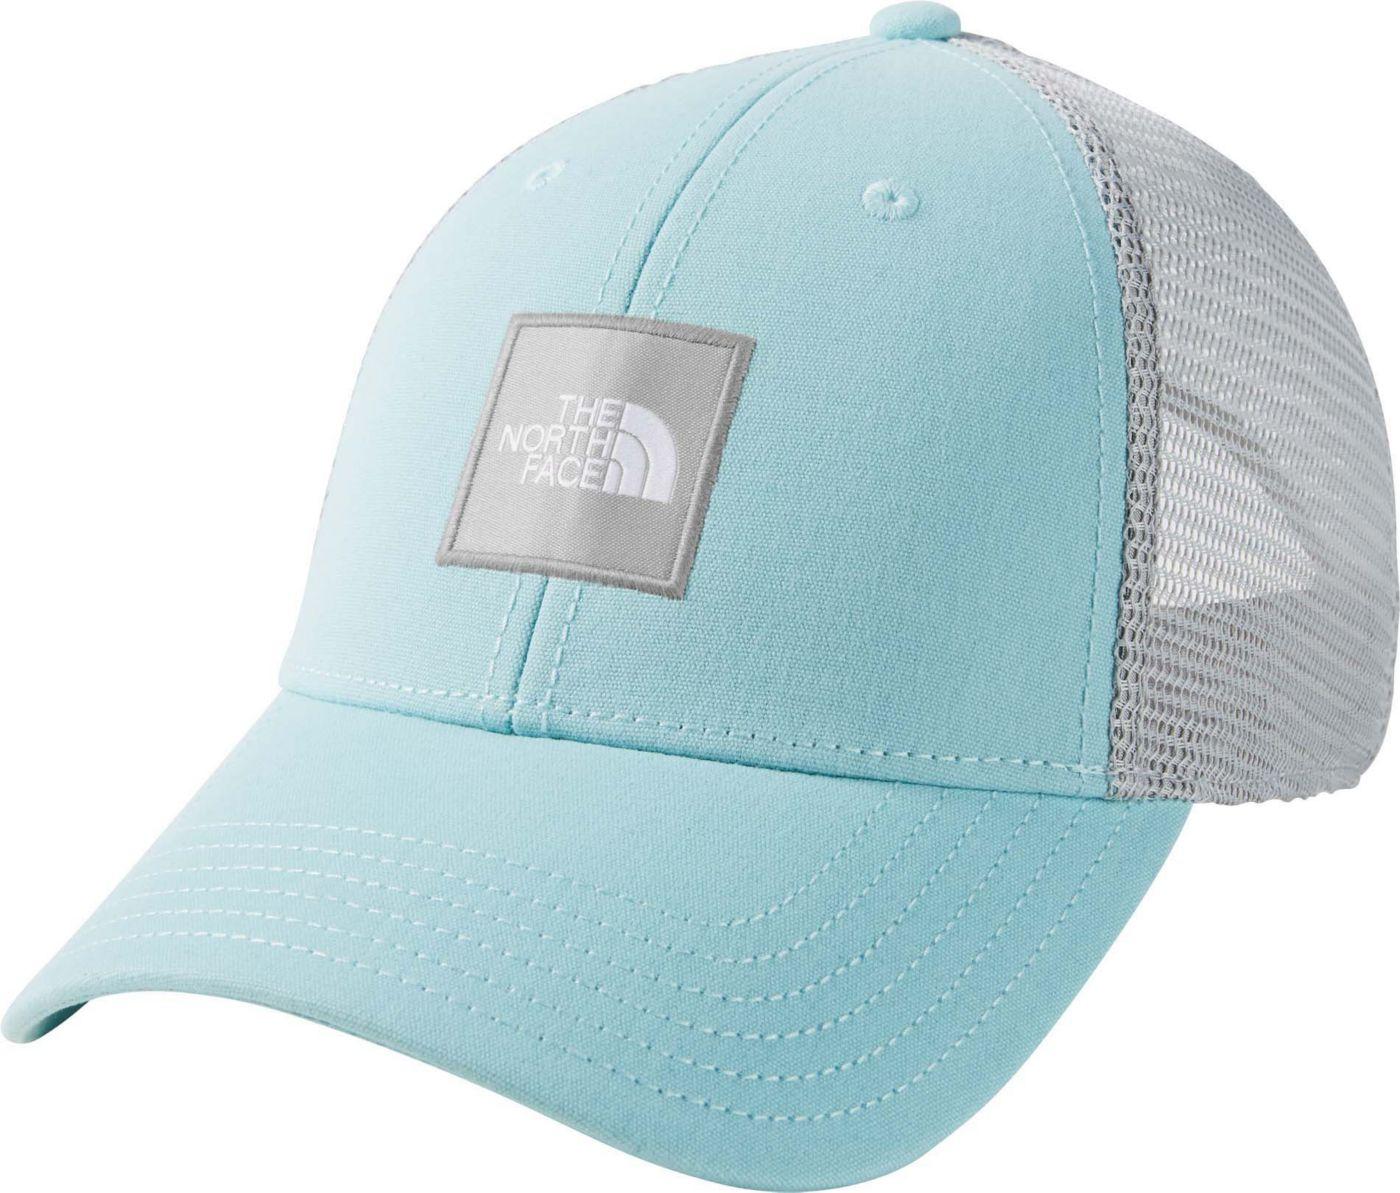 The North Face Men's Box Logo Trucker Hat